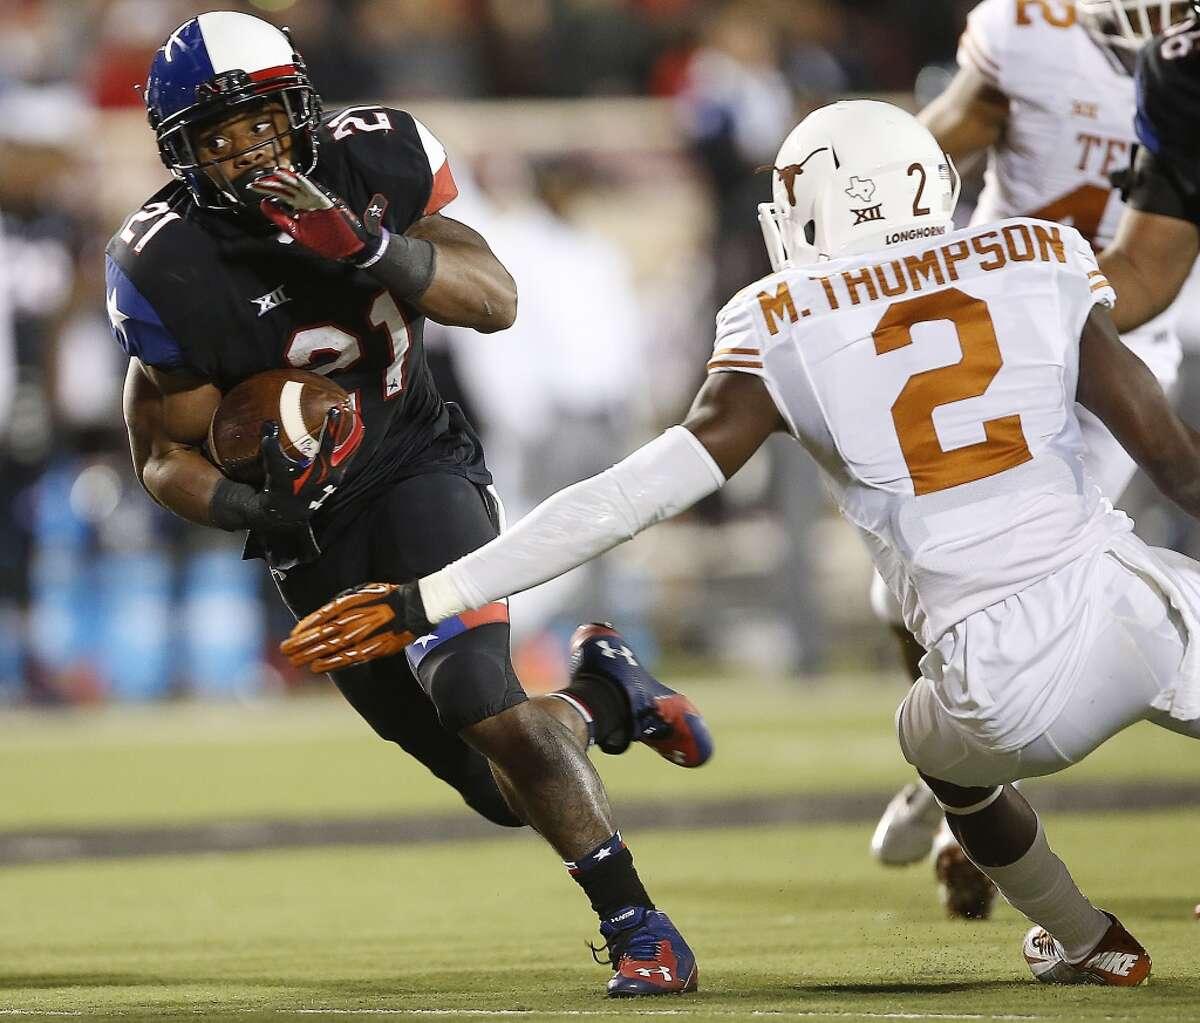 Texas Tech's DeAndre Washington runs past Texas' Mykkele Thompson during an NCAA college football game in Lubbock, Texas, Saturday, Nov. 1, 2014. (AP Photo/Lubbock Avalanche-Journal, Tori Eichberger)